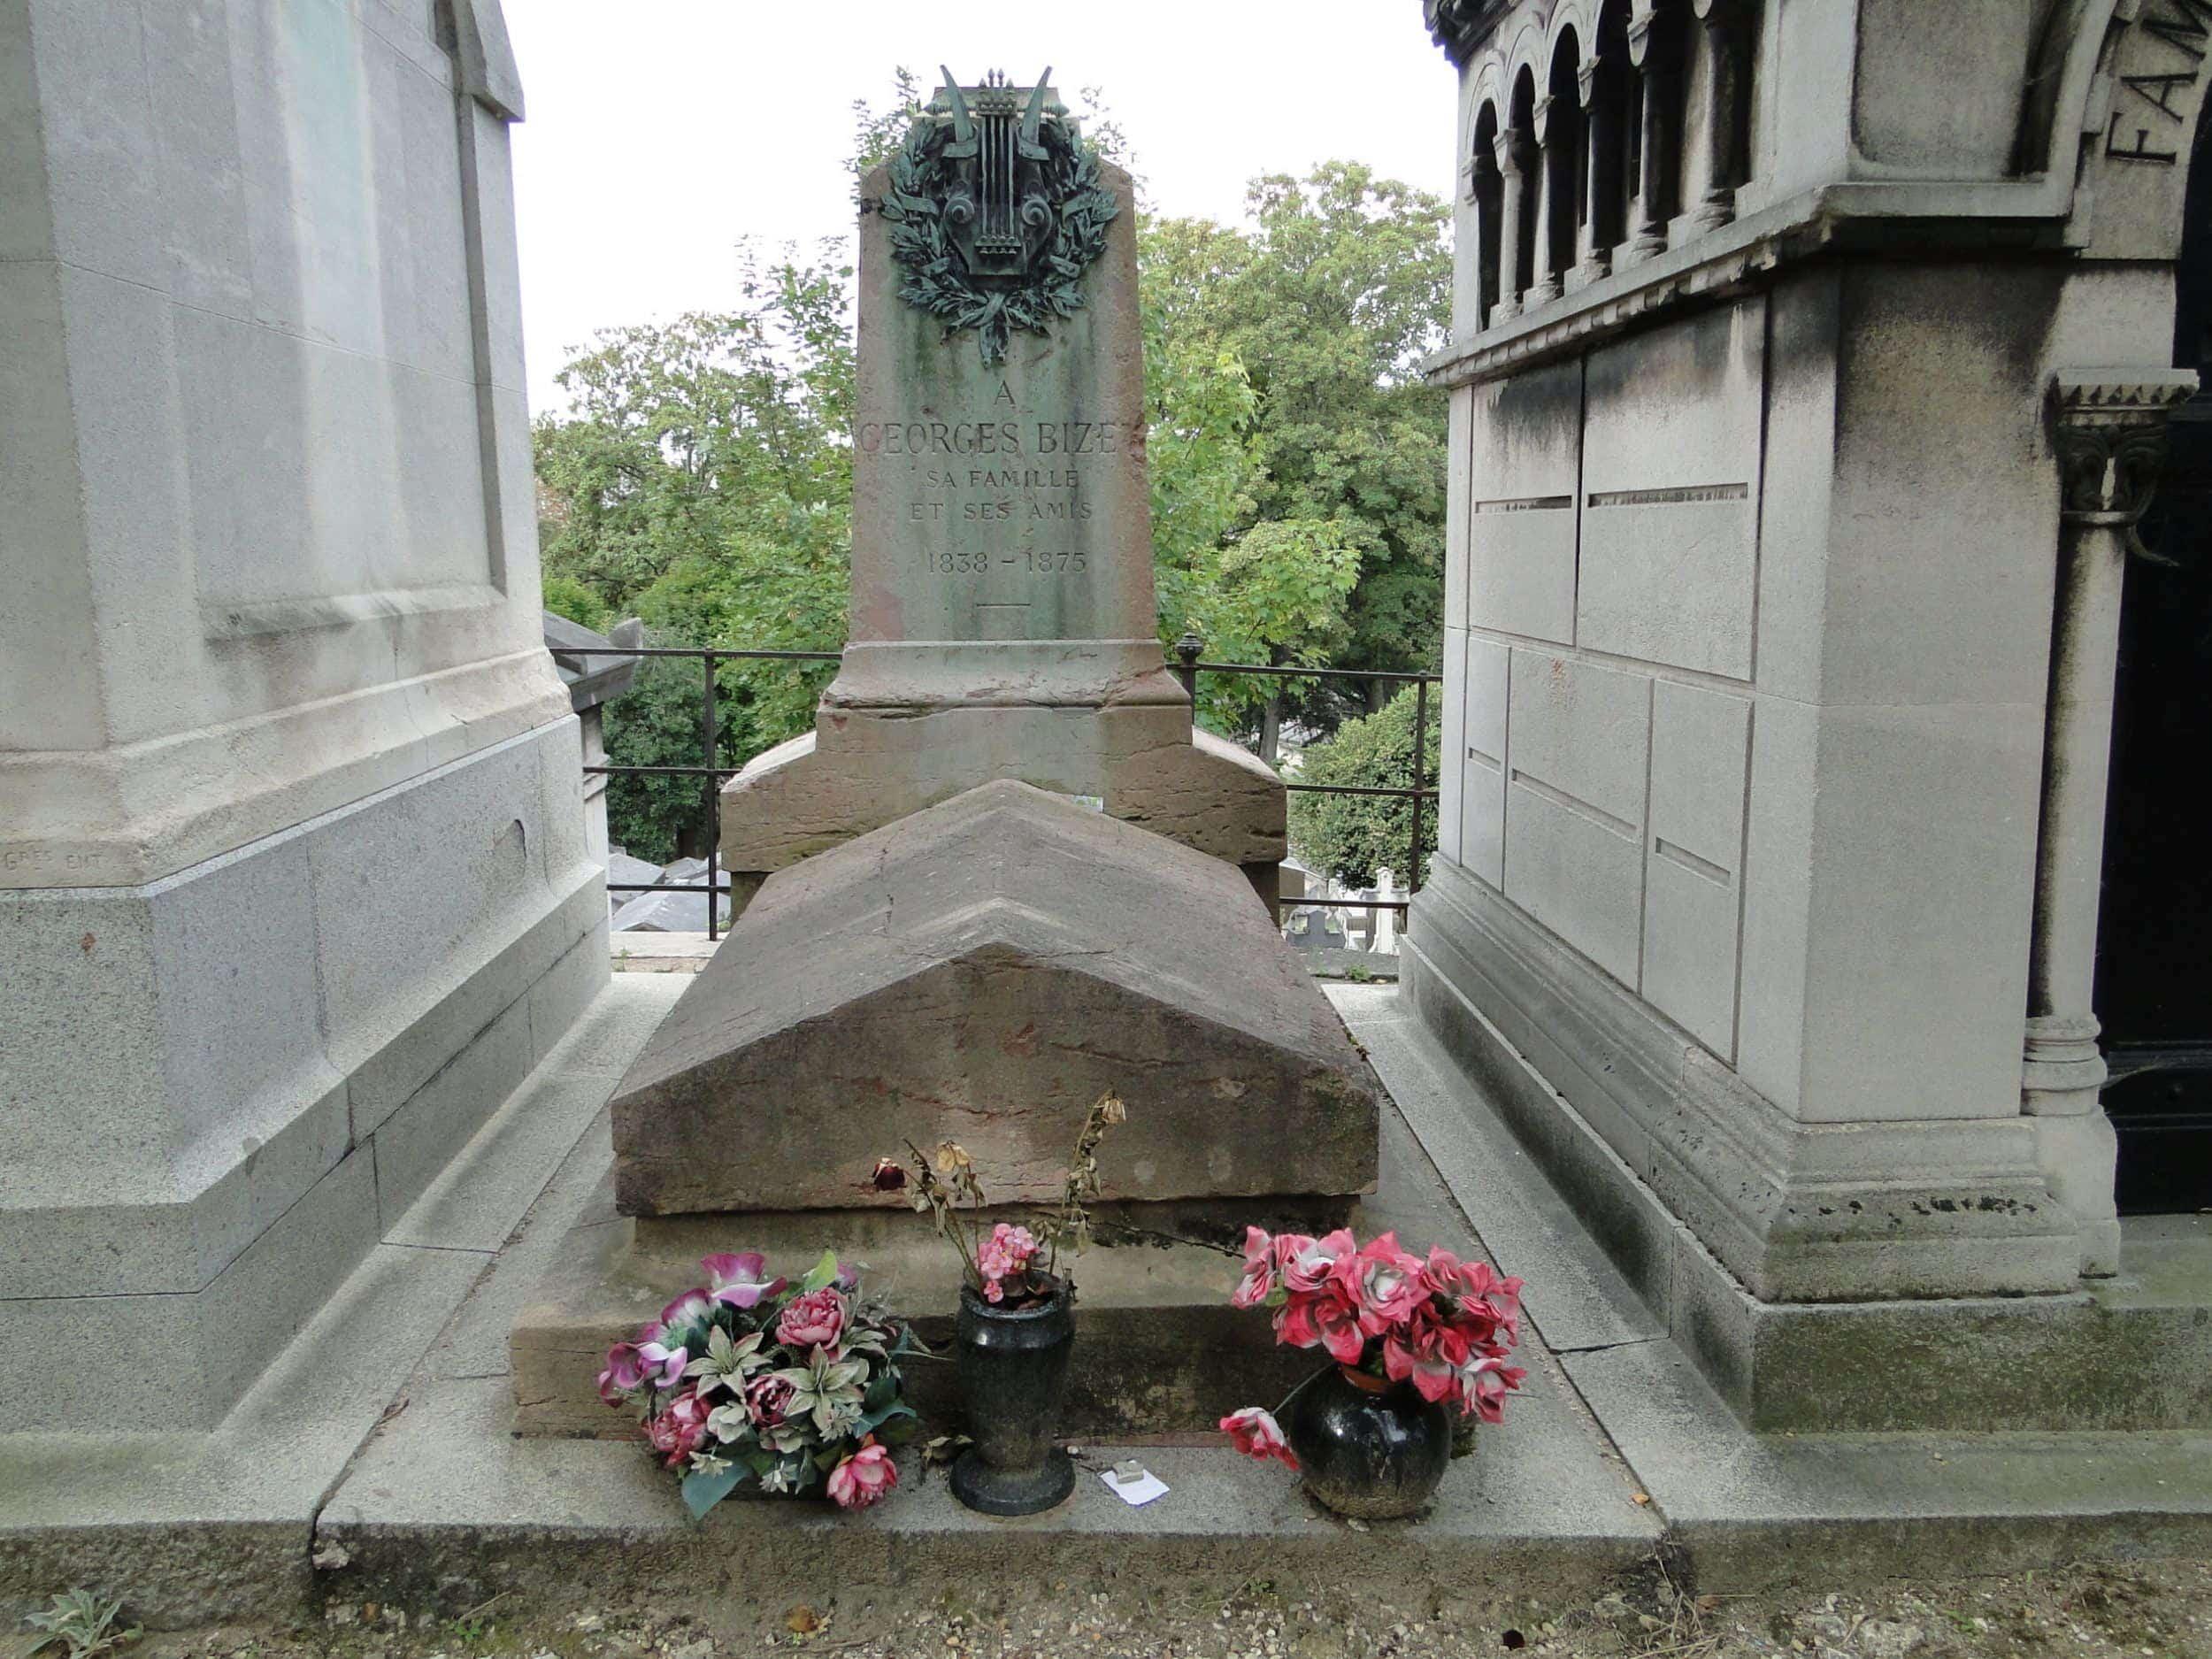 Памятник Жоржу Бизе украден с кладбища Пер-Лашез